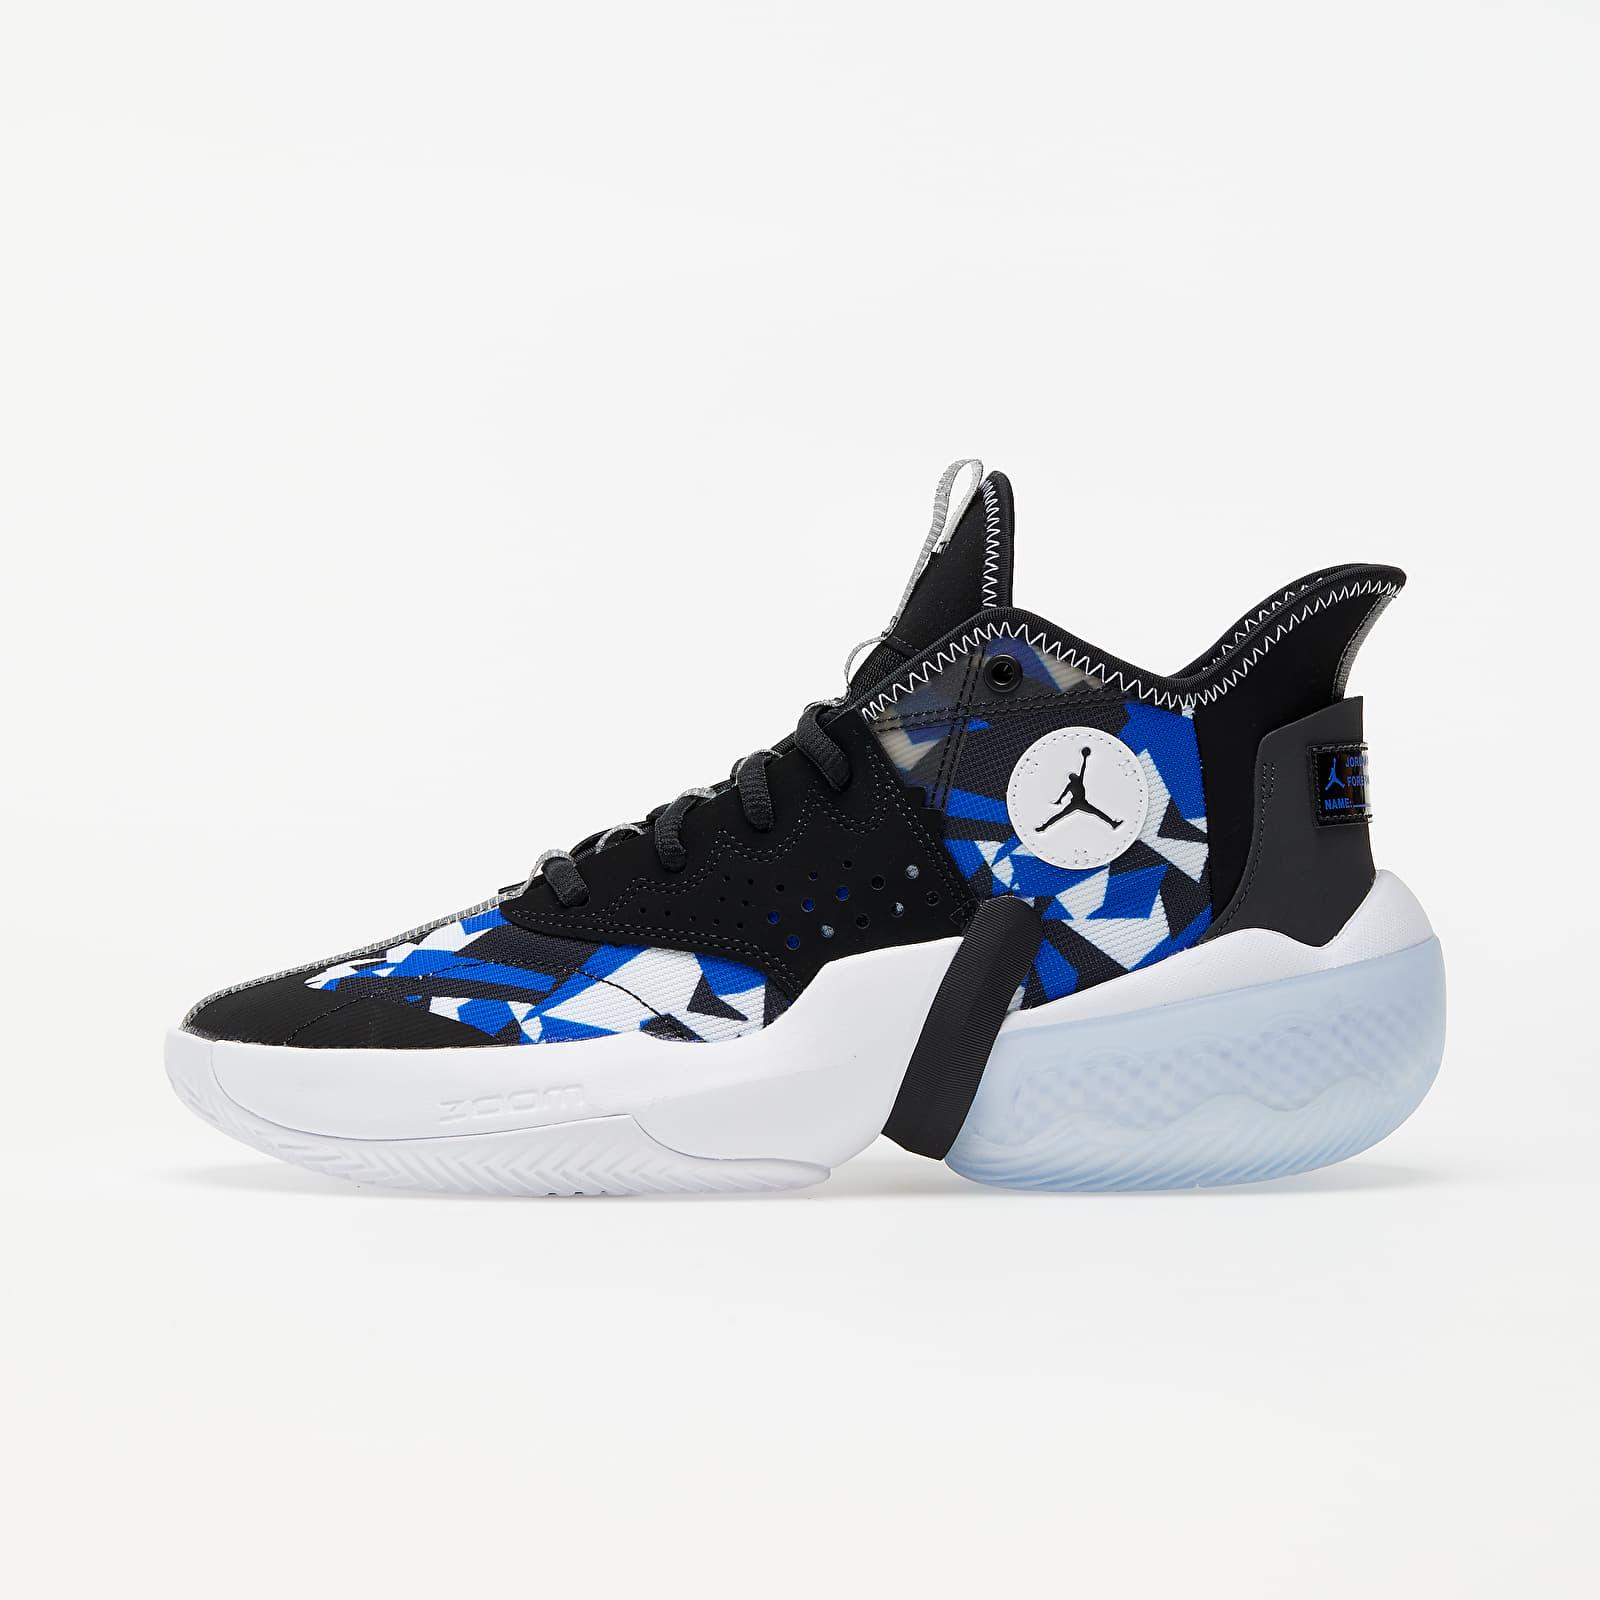 Zapatillas Hombre Jordan React Elevation Black/ Racer Blue-White-Ice